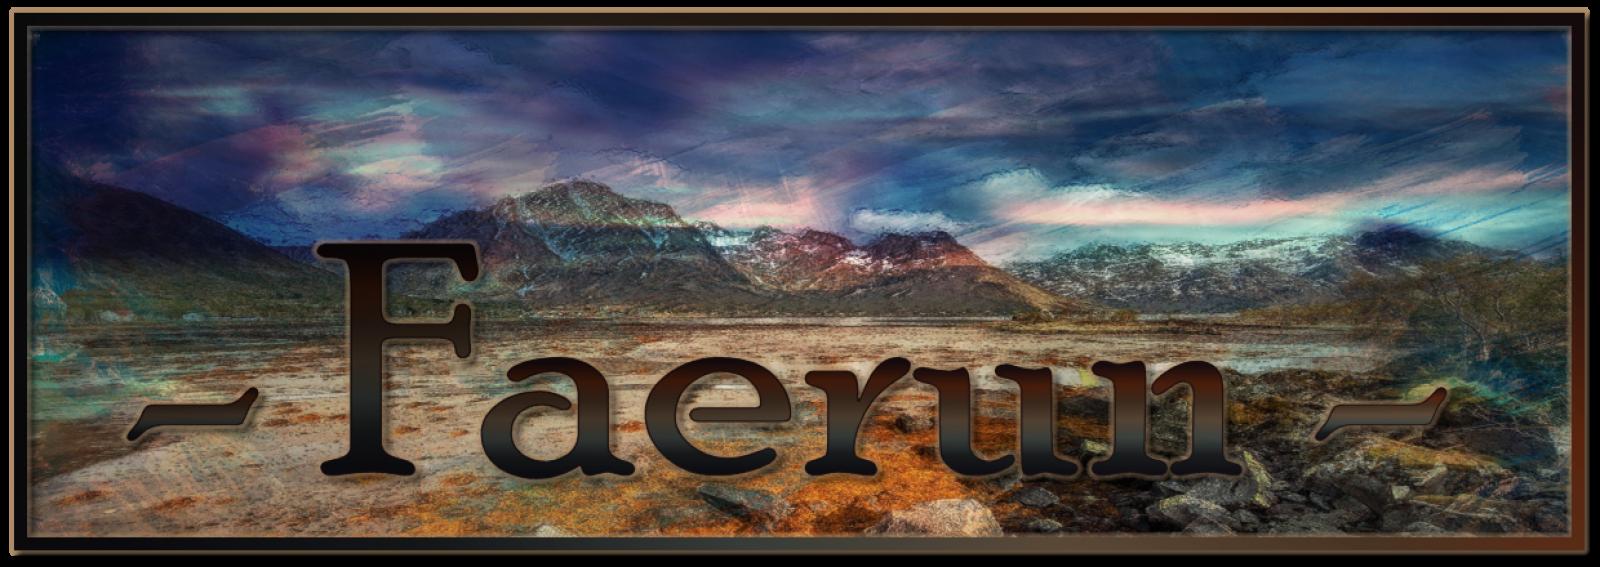 Forgotten Realms Homepage | World Anvil